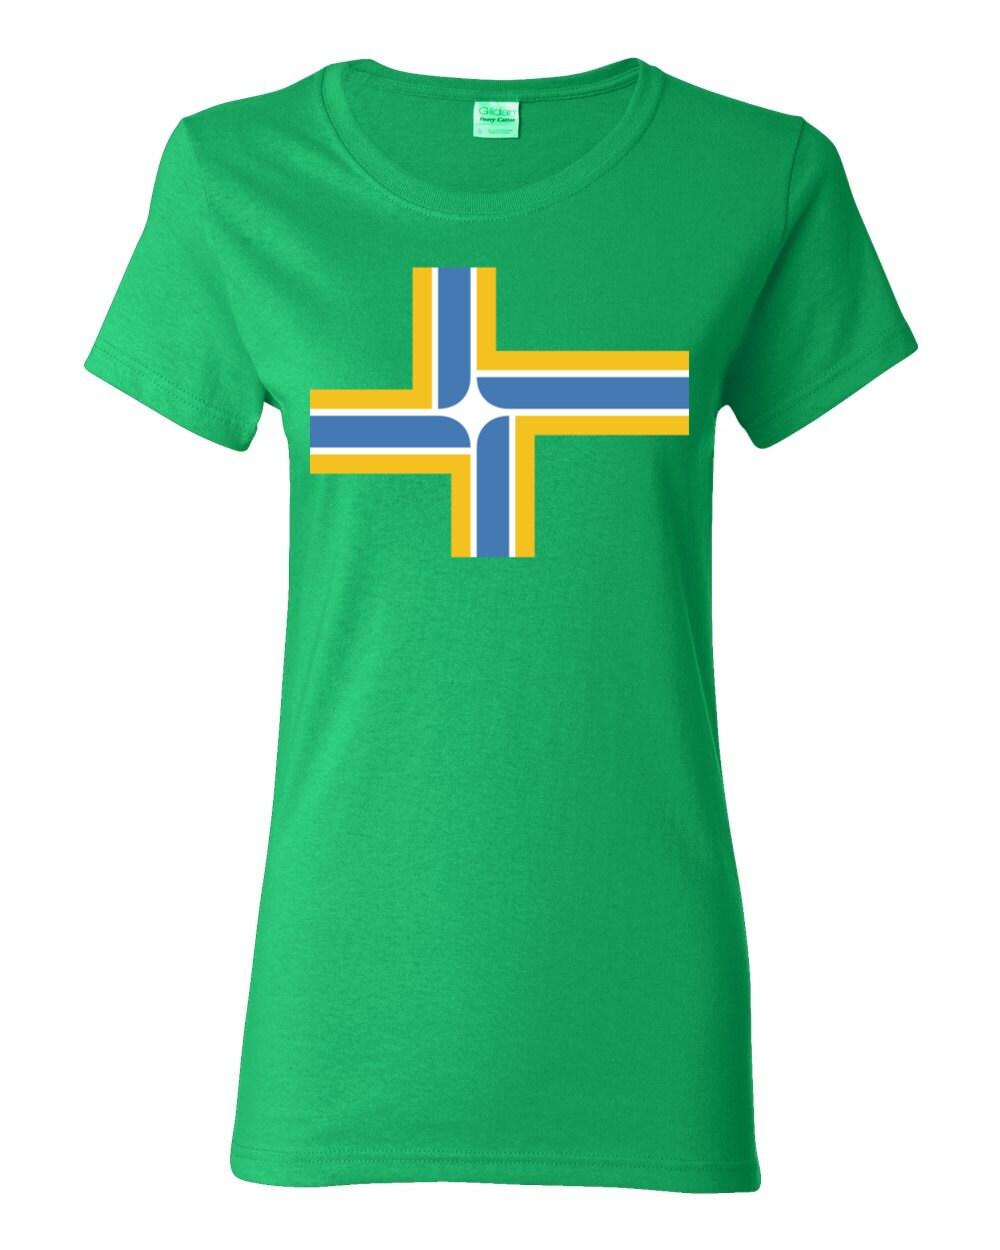 Portland T-shirt - Portland Oregon City Flag - Portland Womens T-shirt